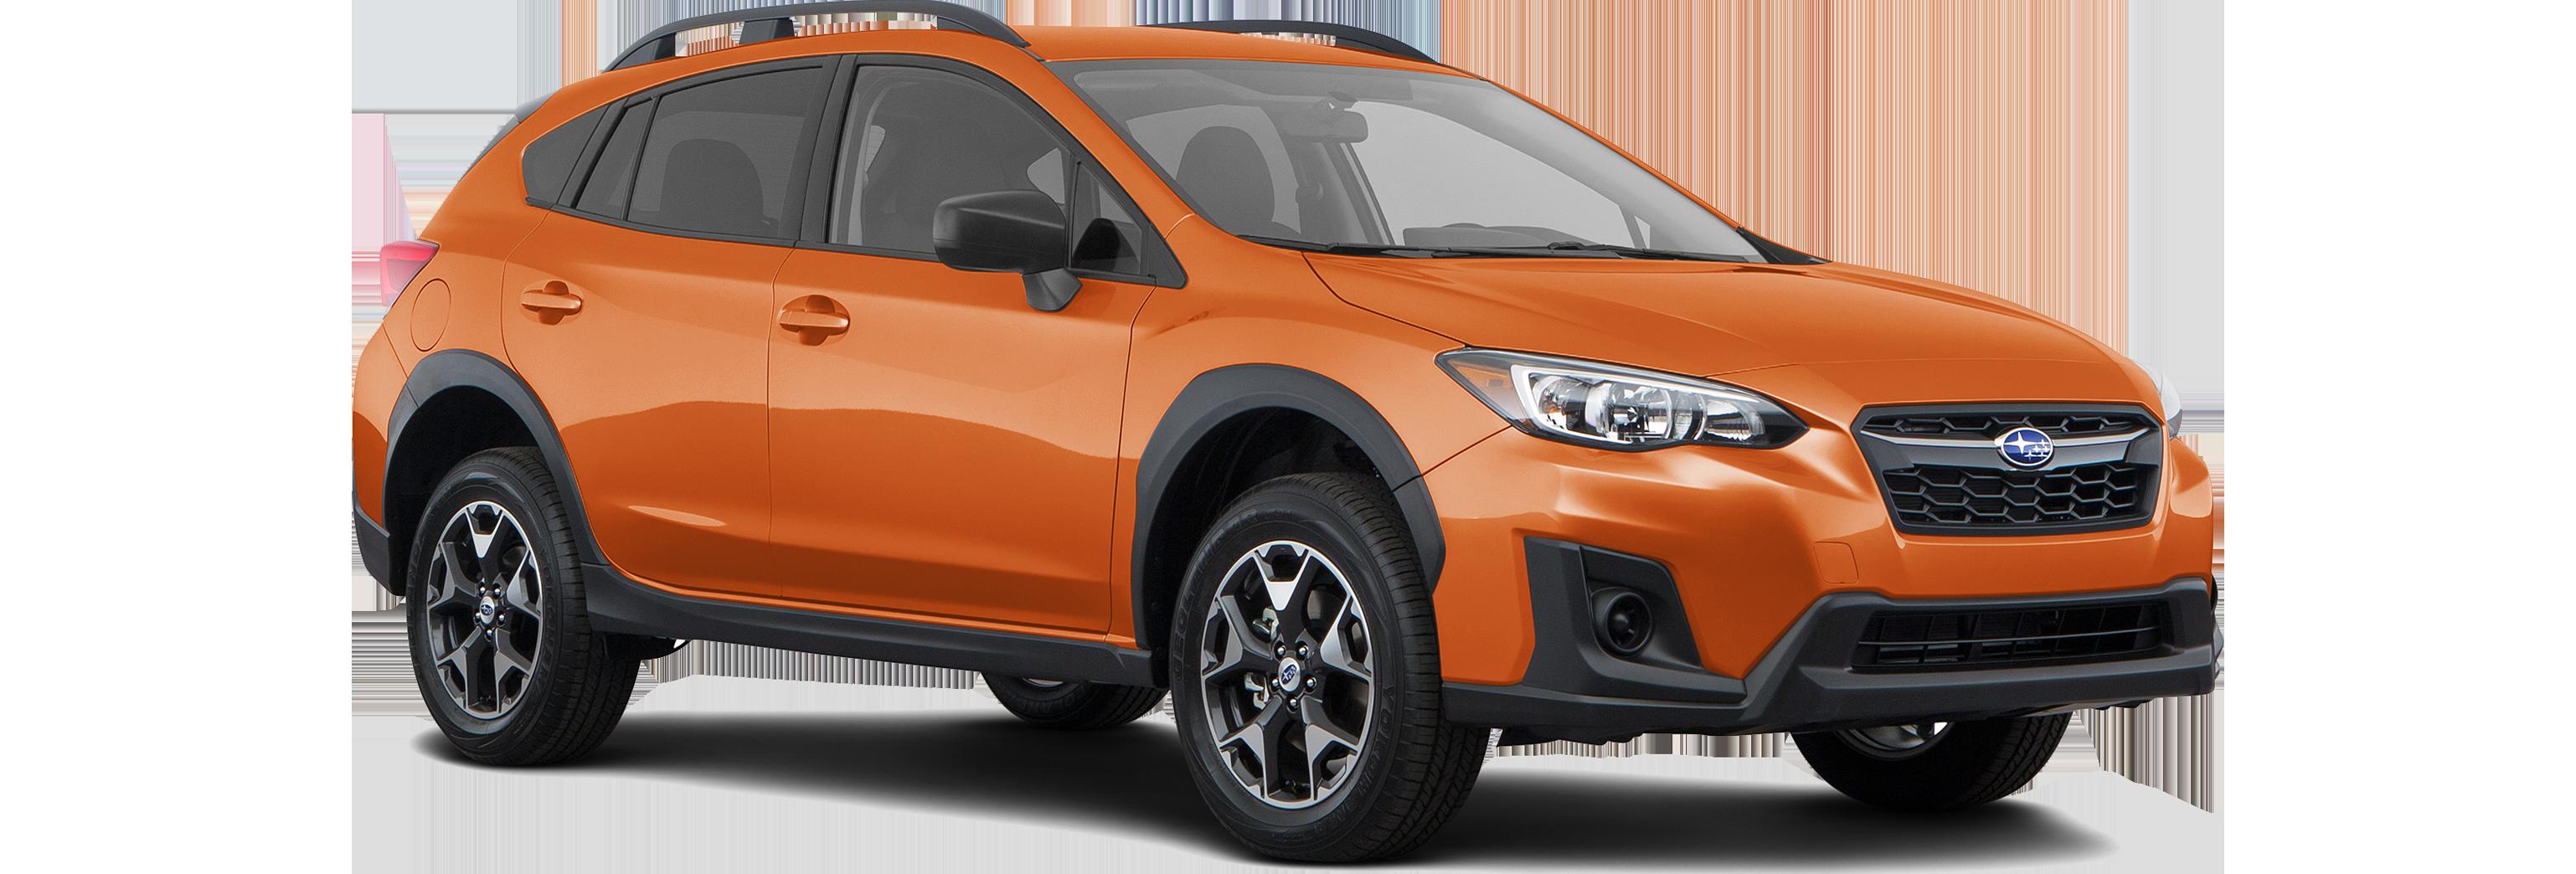 Subaru Walnut Creek >> 2019 Subaru Crosstrek Model Overview | Livermore, CA ...